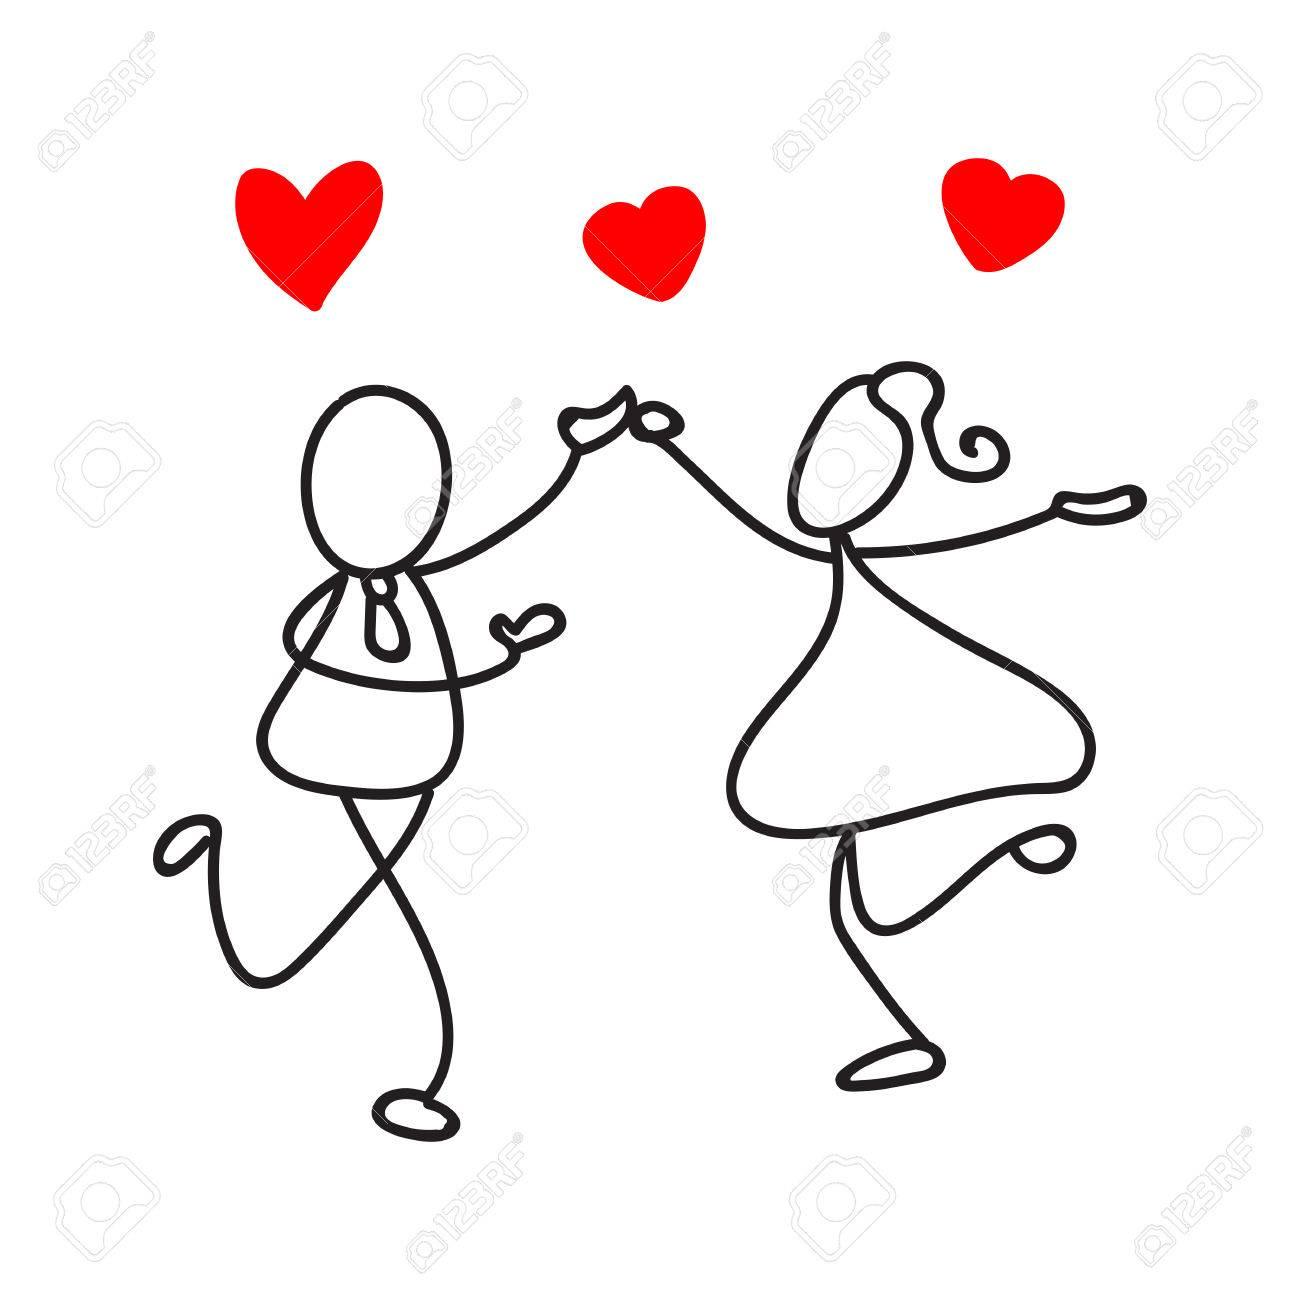 Main Dessin Resume Gens Couple Amour Danse Mariage Romance